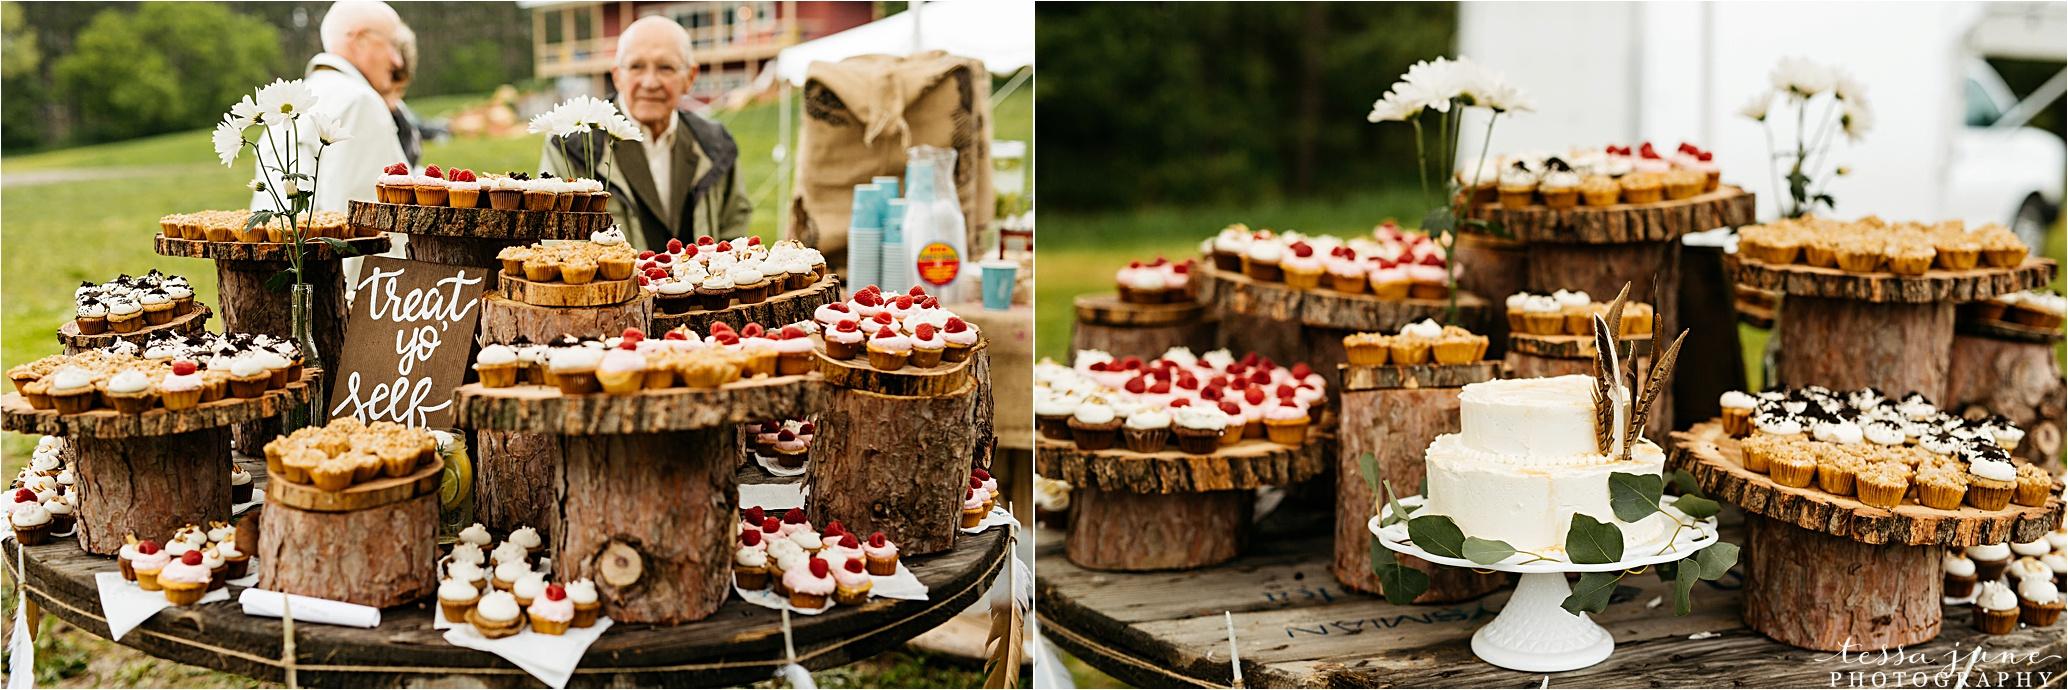 bohemian-forest-wedding-stillwater-minnesota-flower-crown-st-cloud-photographer-reception-cake-cupcakes